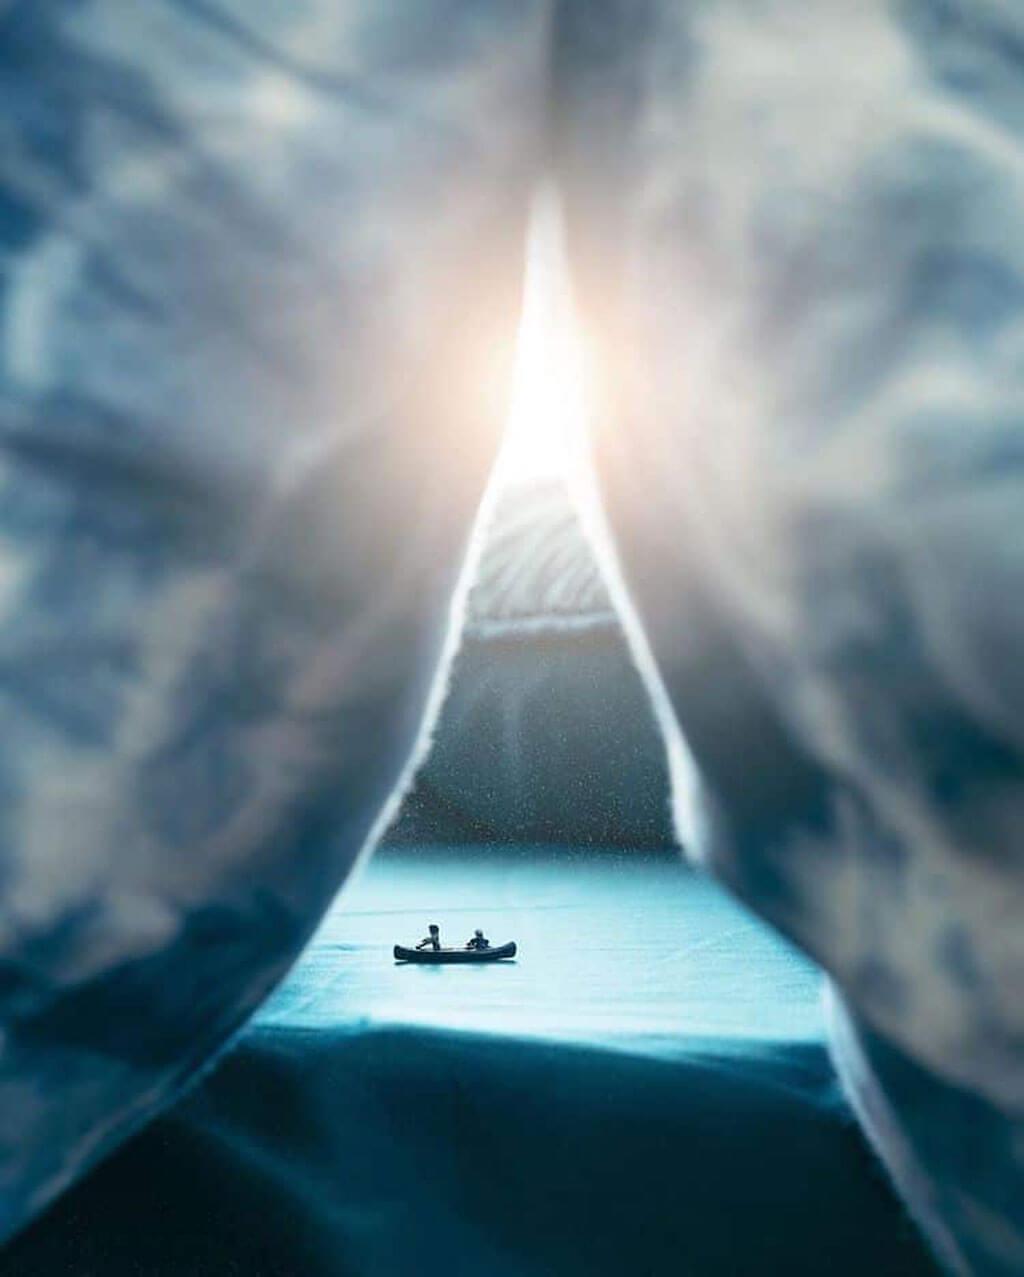 Canoe trip miniature scene